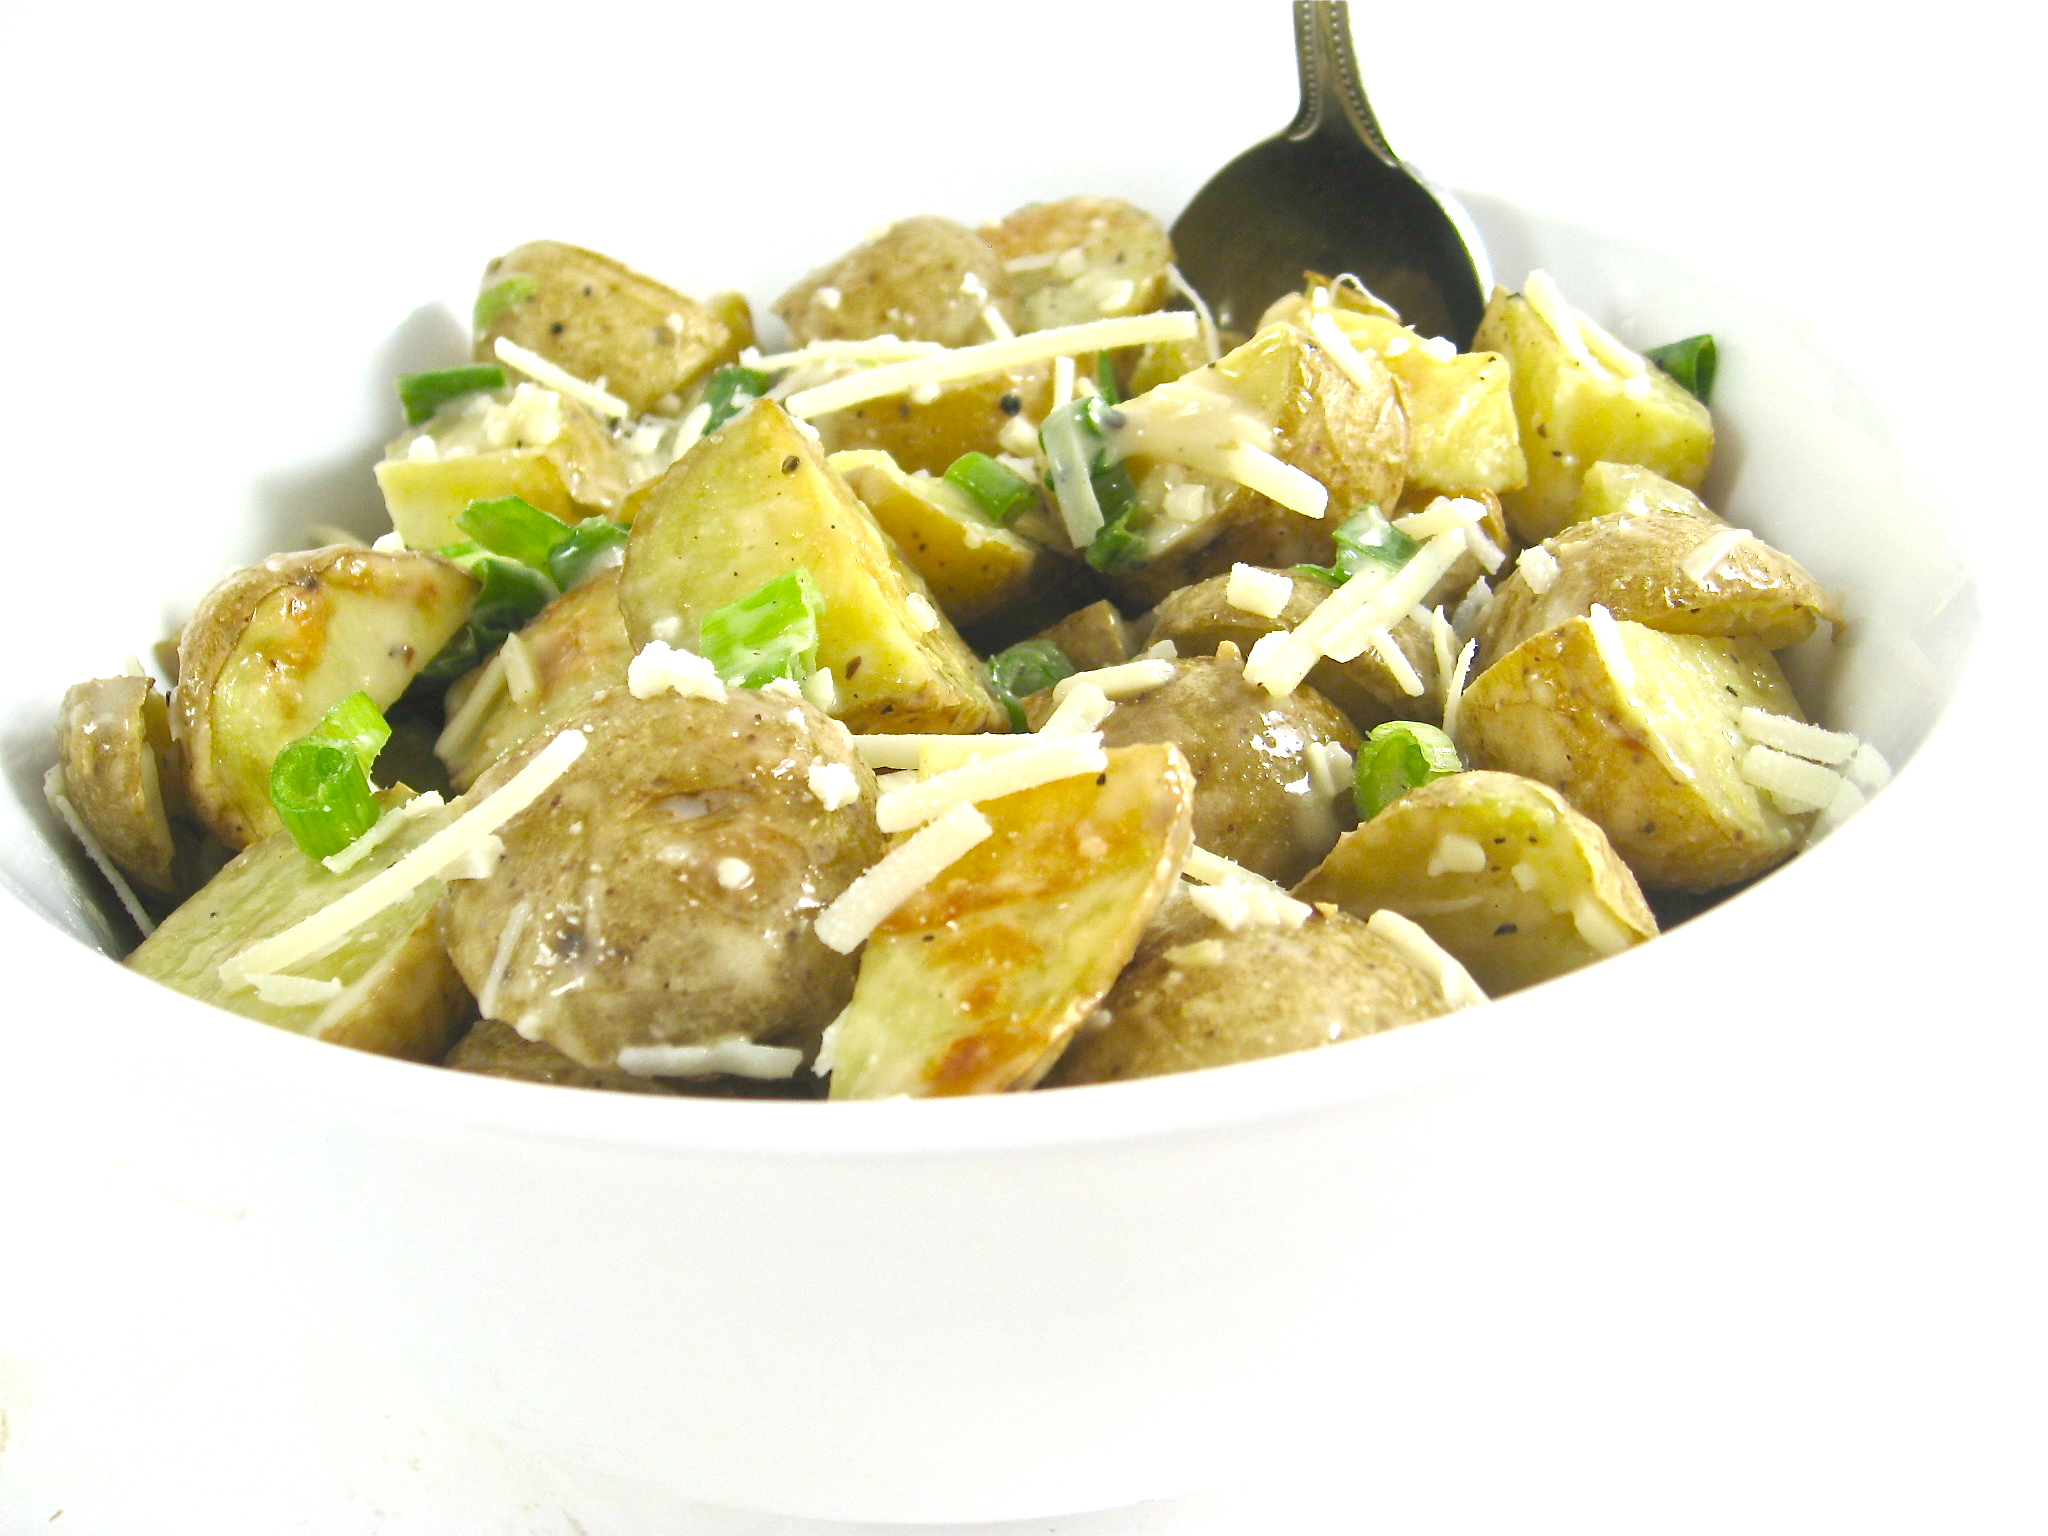 Skinny Potato Salad, Caesar Style with Weight Watchers Points | Skinny ...